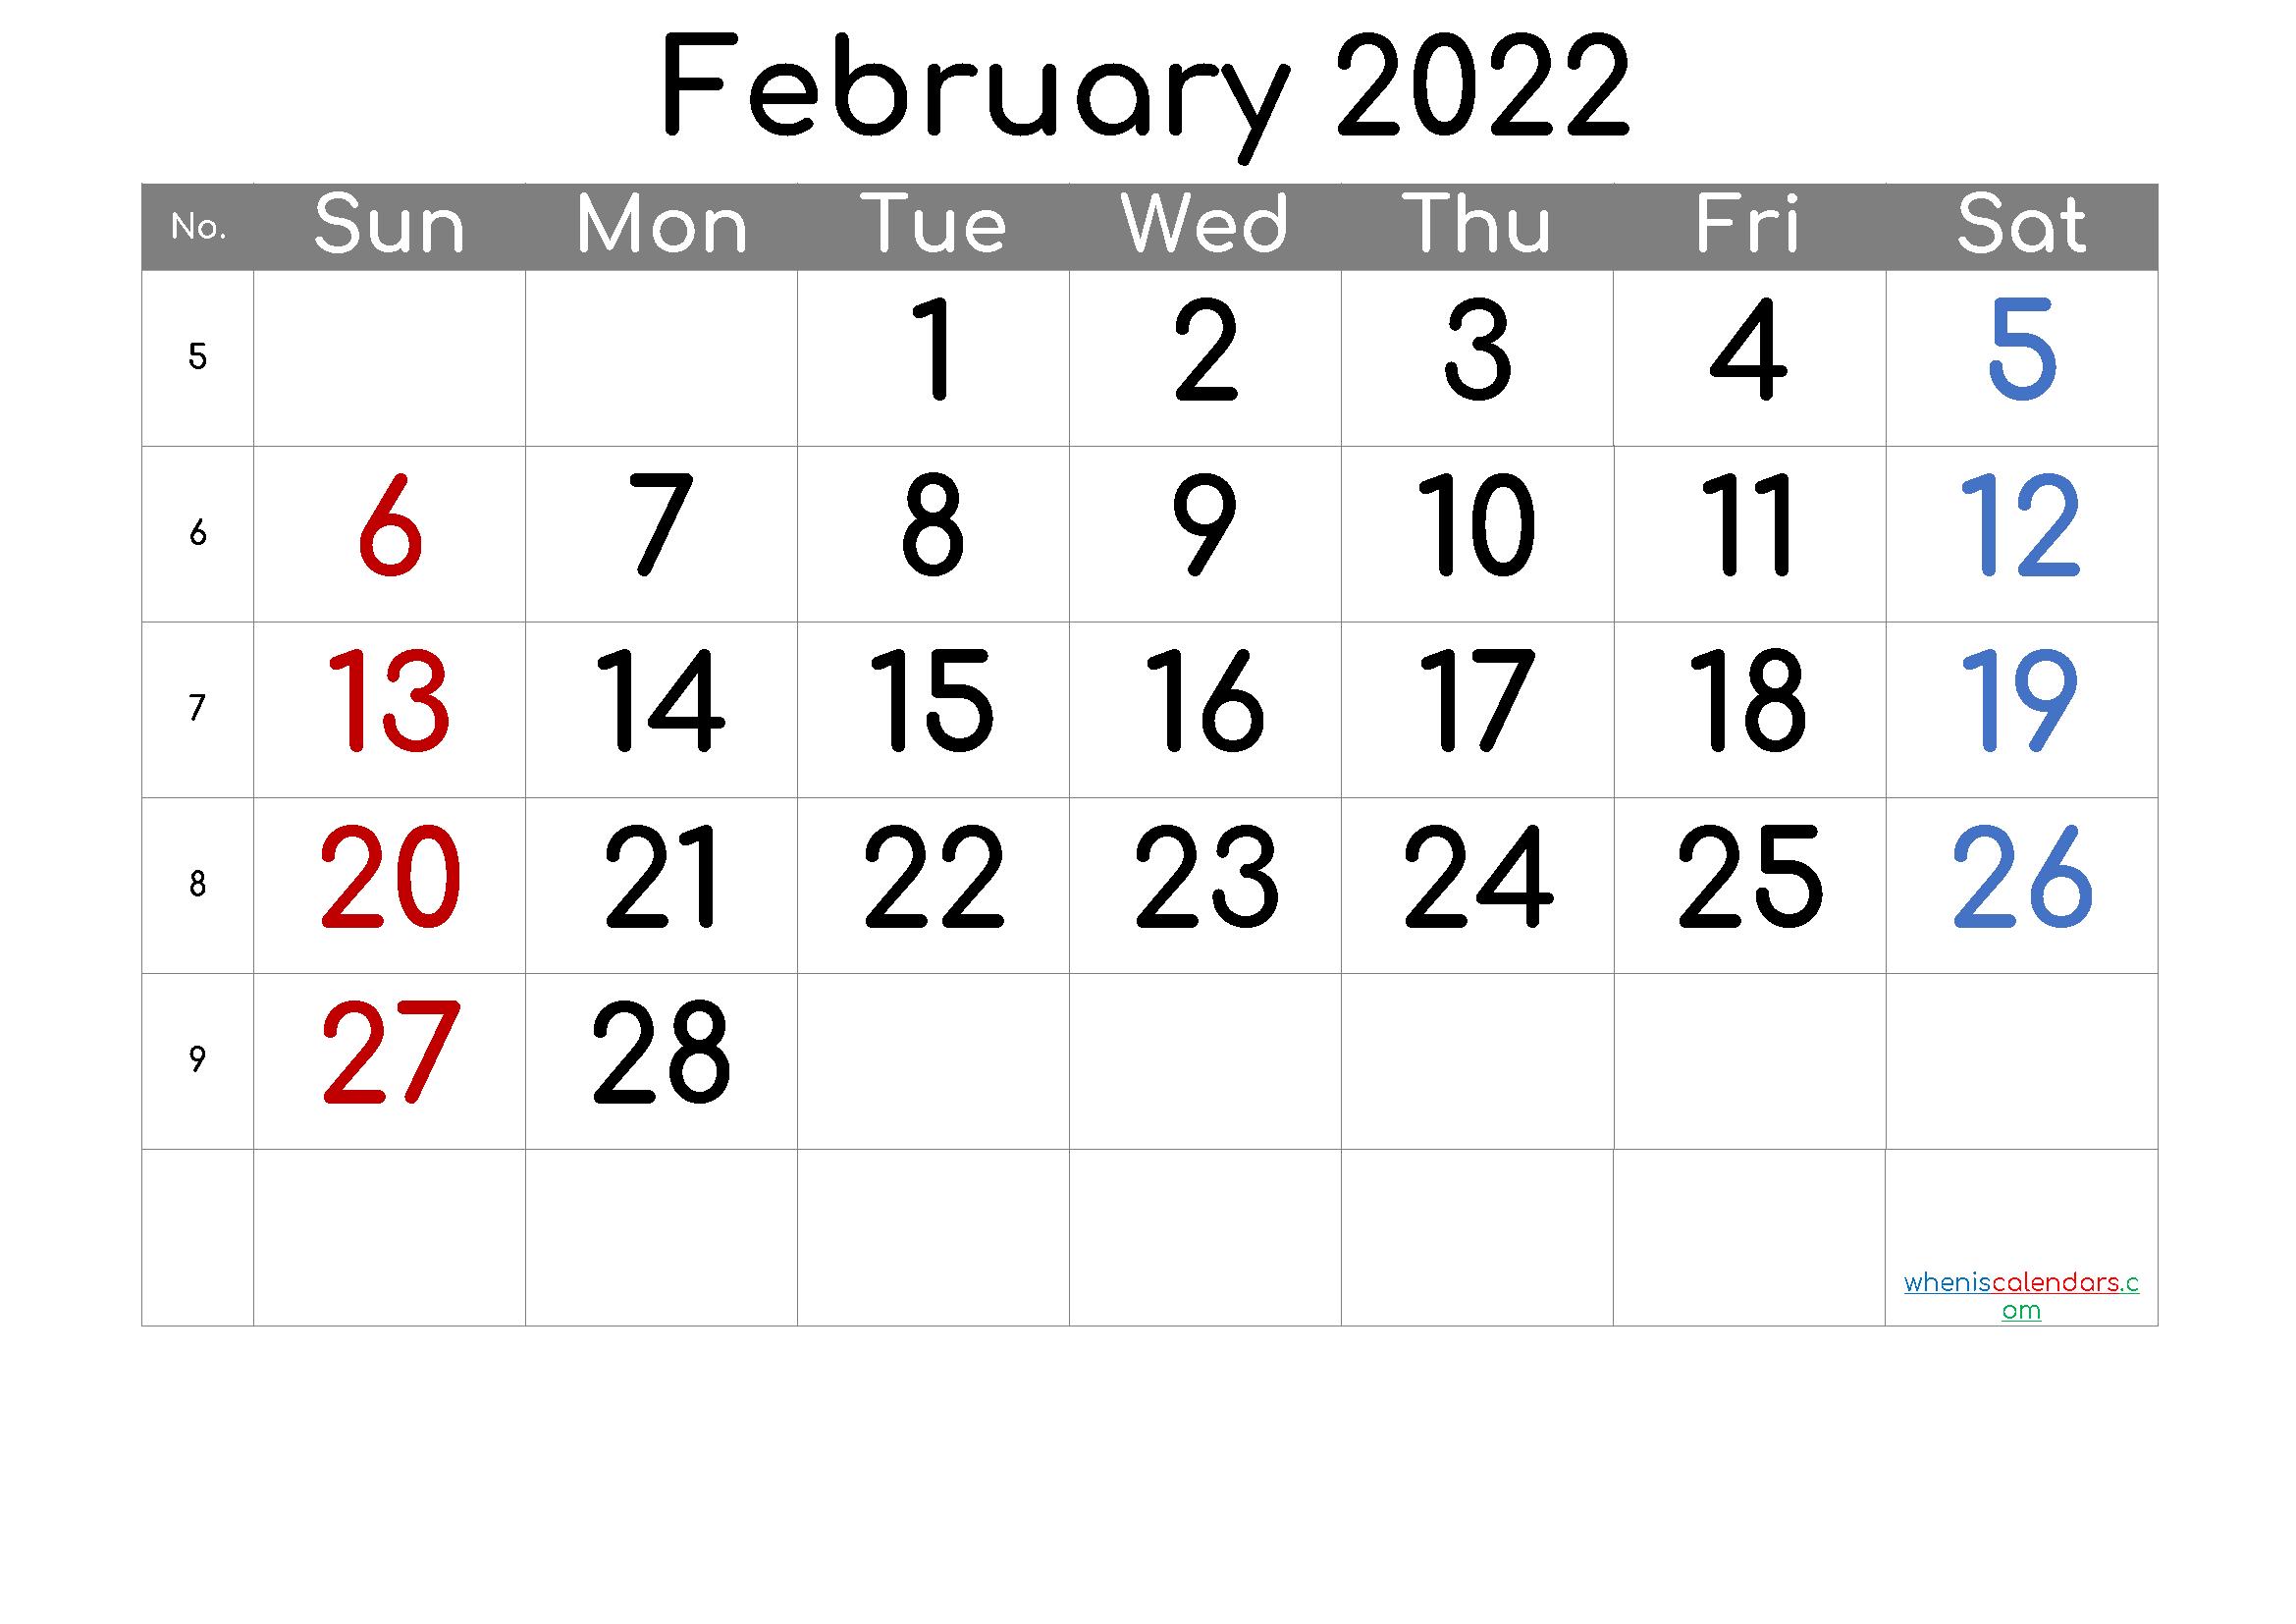 February 2022 Printable Calendar 6 Templates In 2020 Calendar With Week Numbers Free Printable Calendar Printable Calendar Template